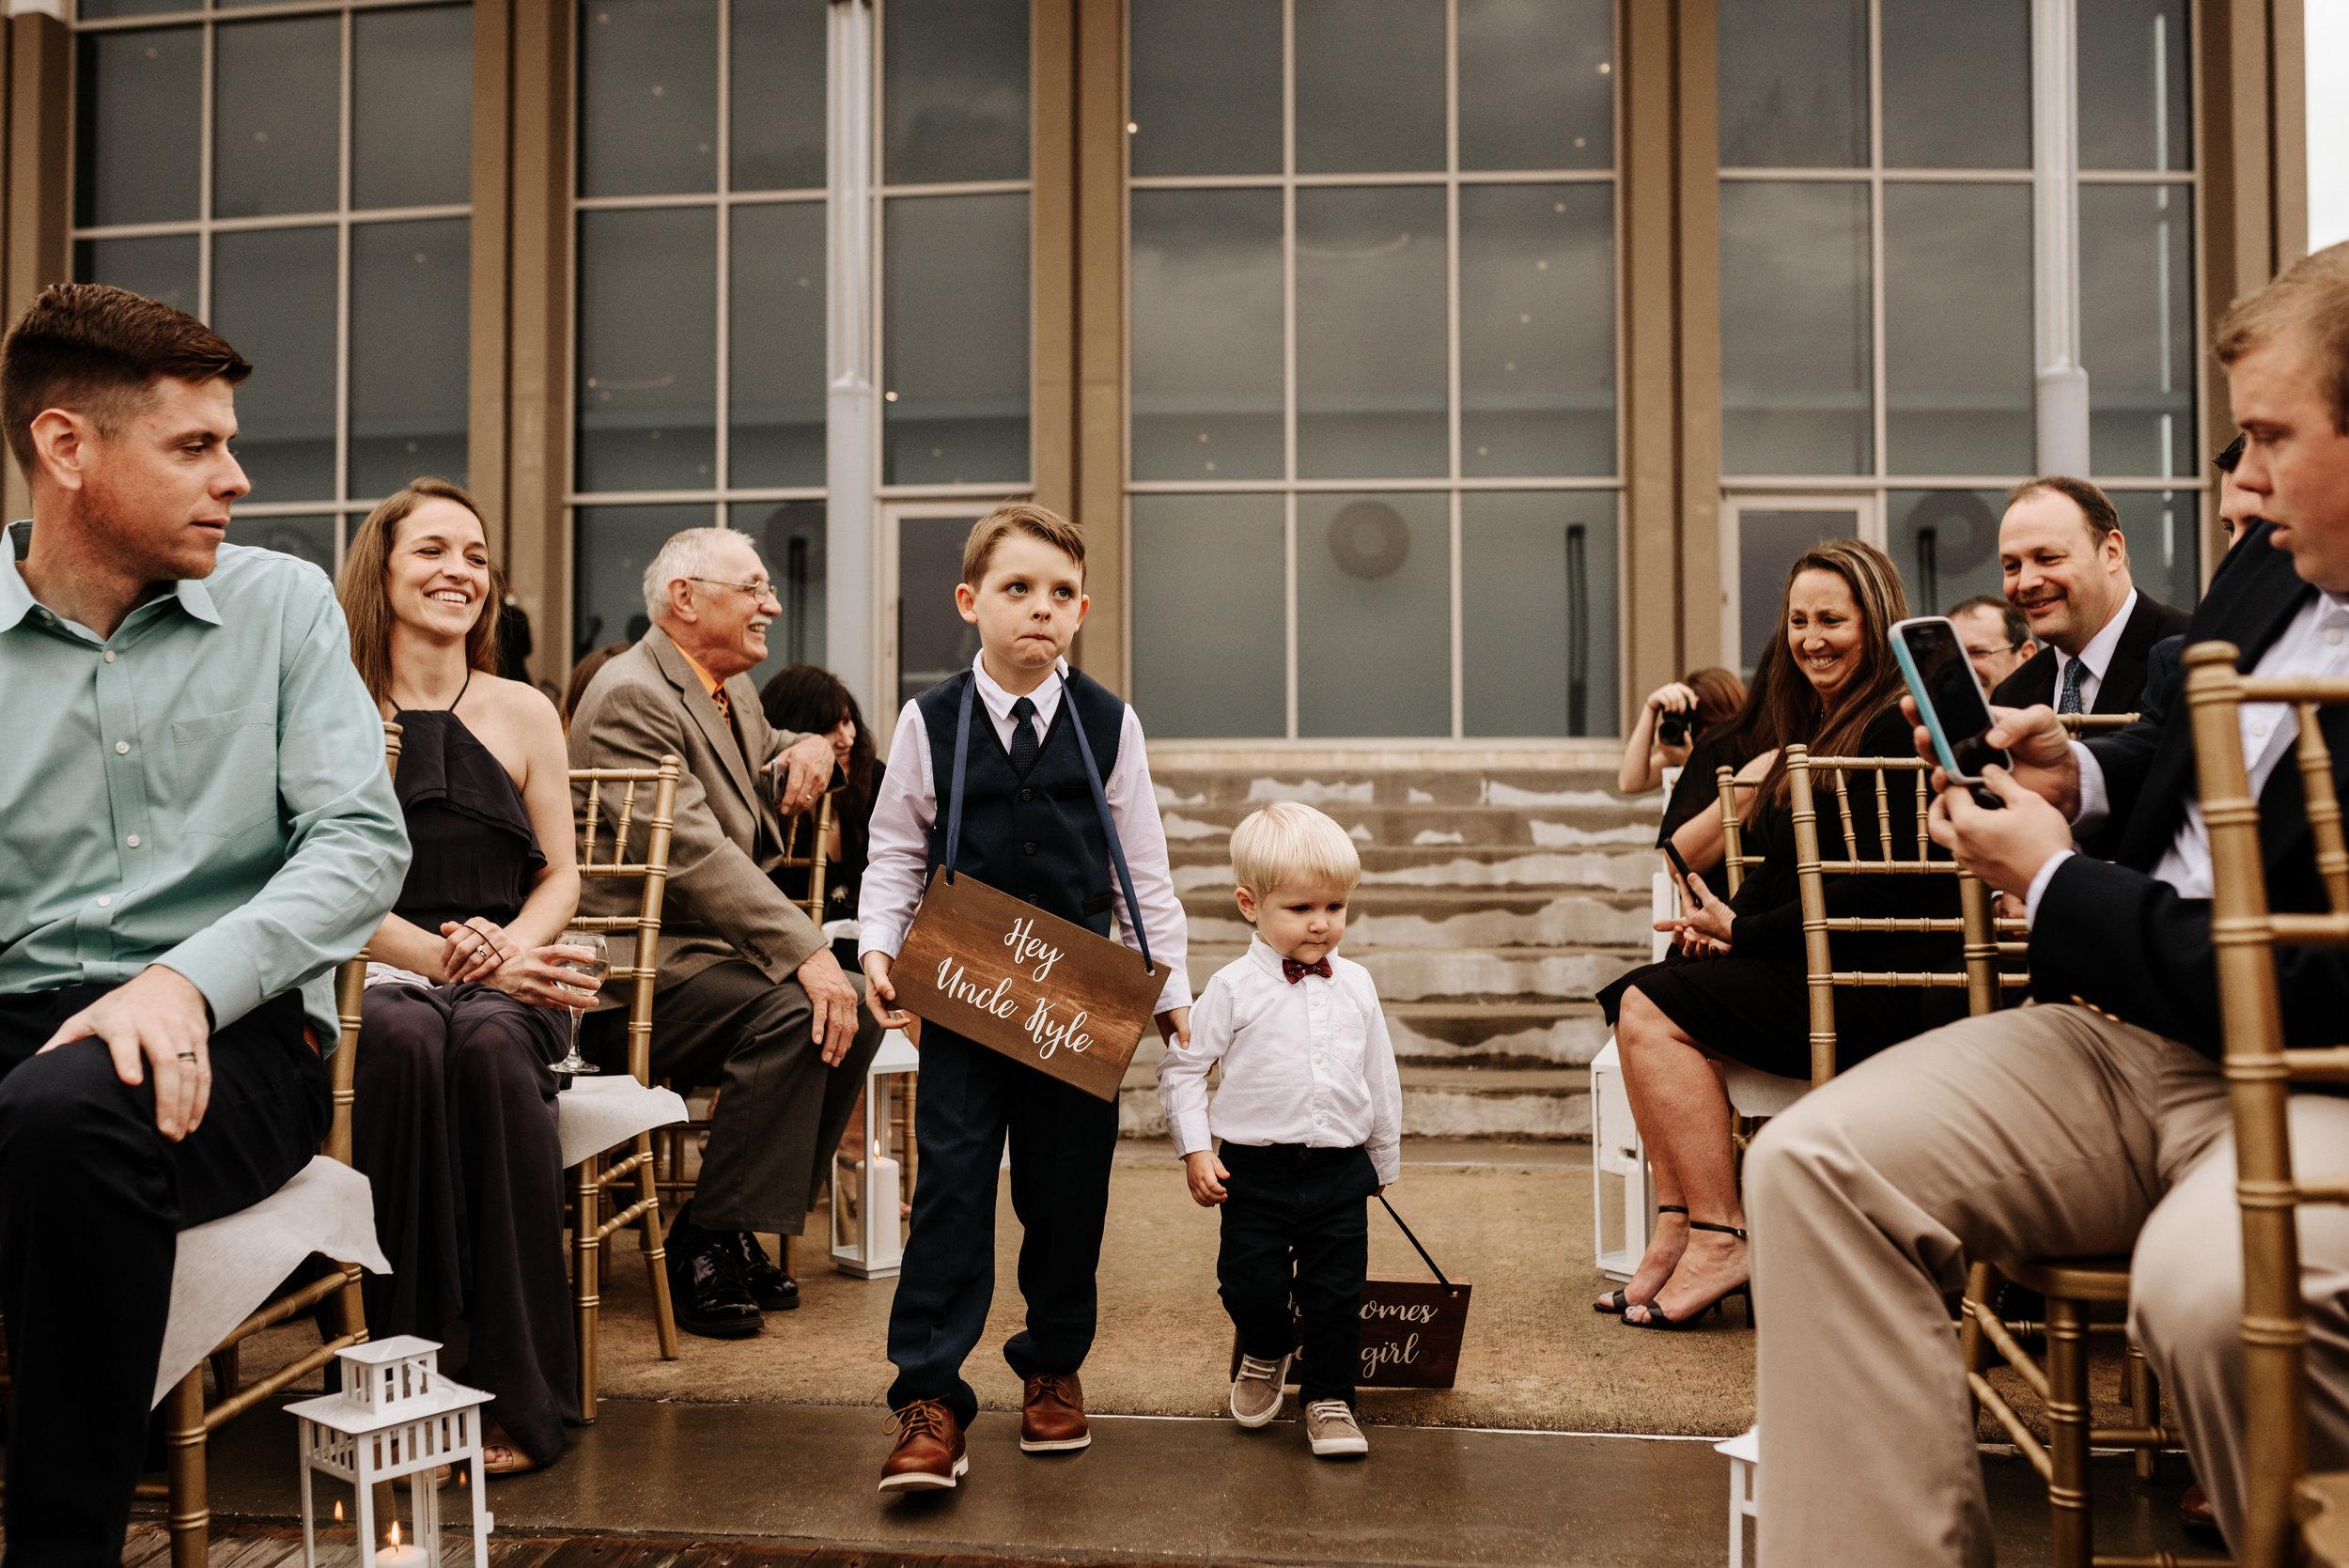 Lauren-Kyle-Brannon-Civic-Center-Wedding-Orlando-Wedding-Photographer-Photography-by-V-0673.jpg